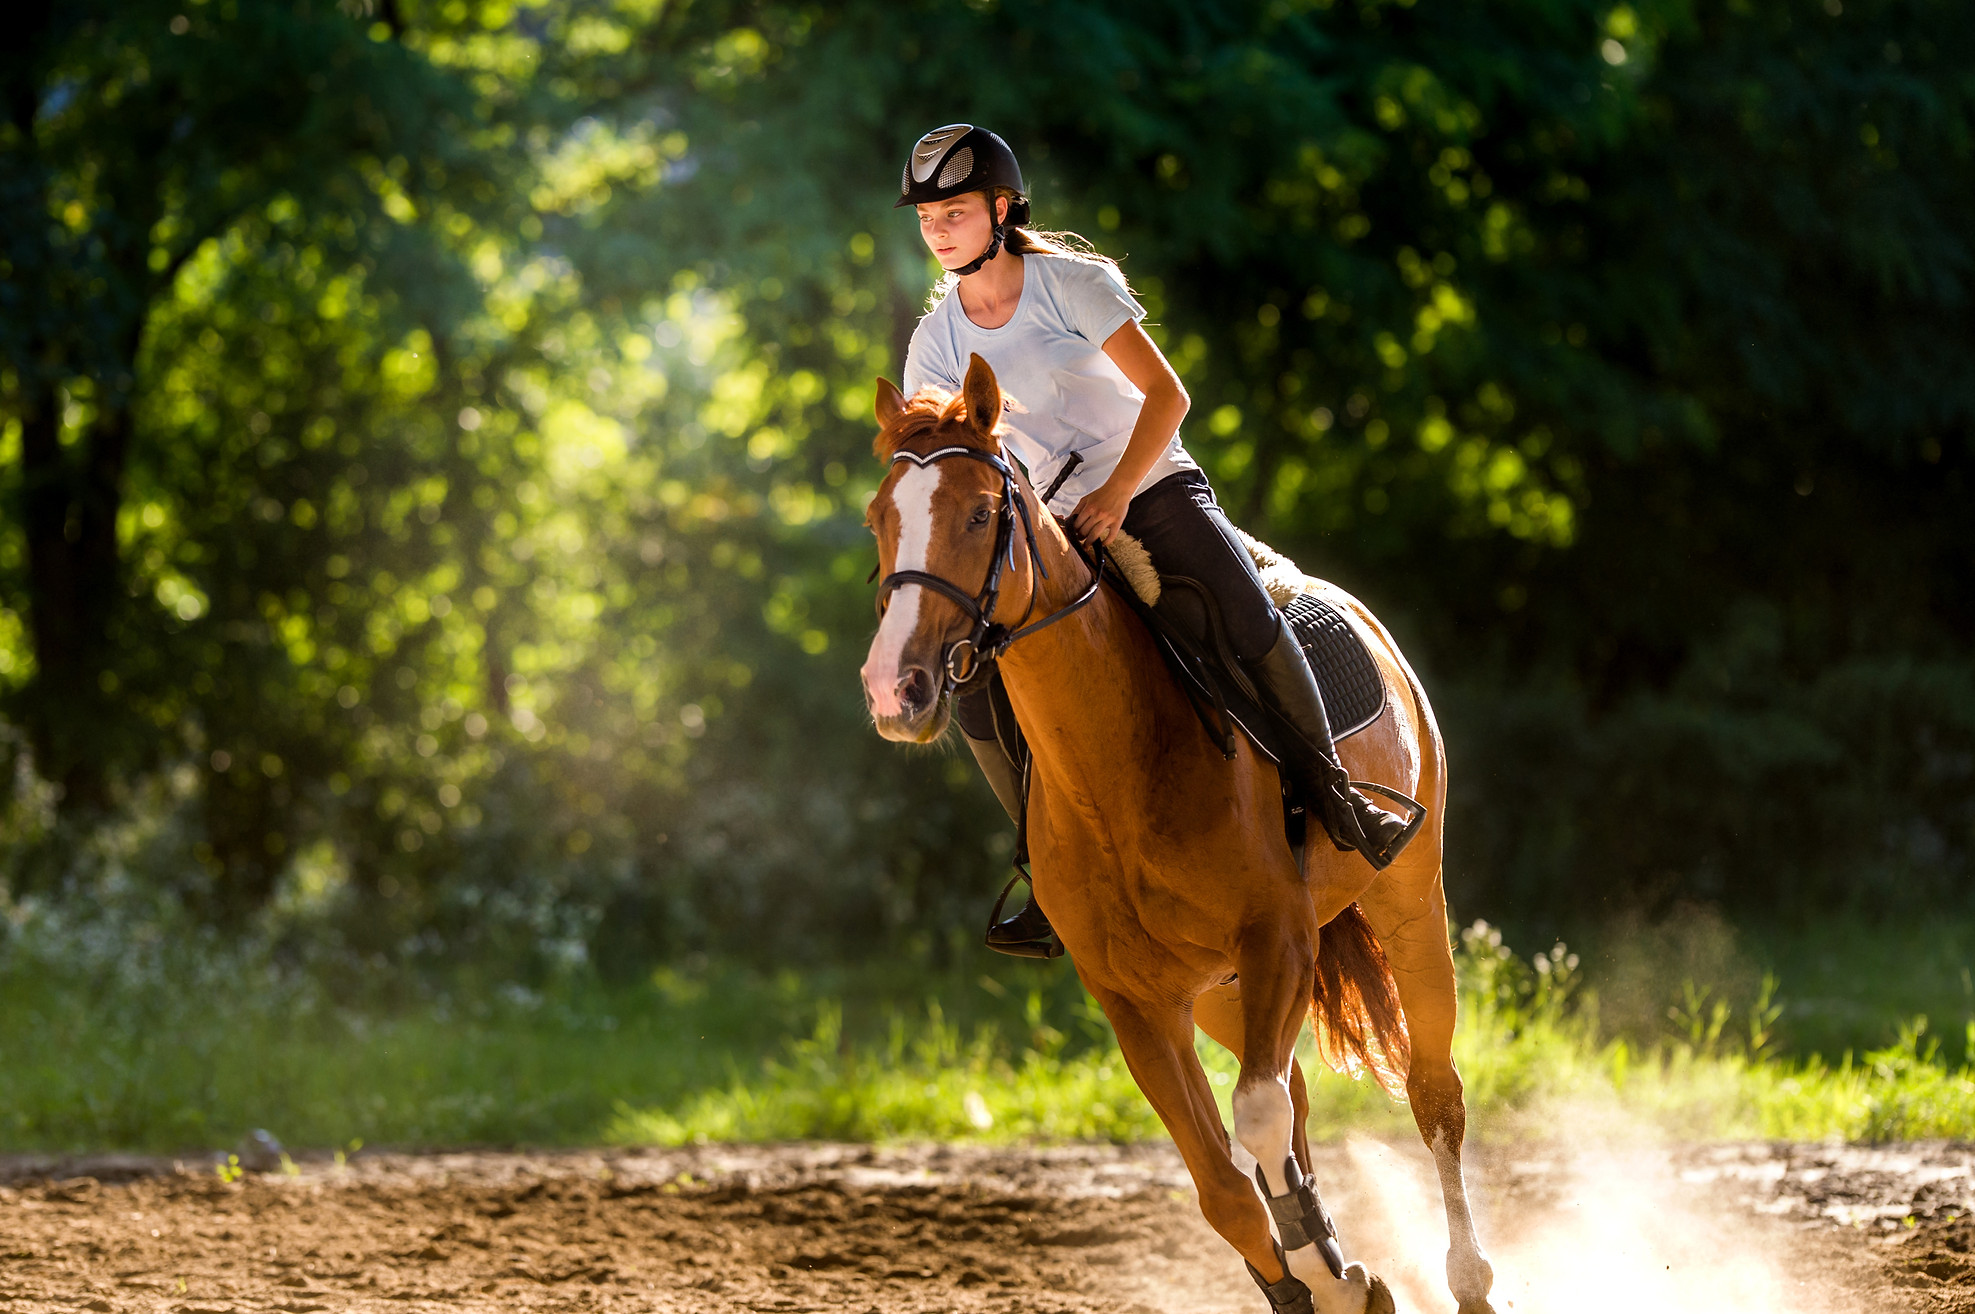 Girl riding at Pennsylvania's Silverstar Valley Saddle Club